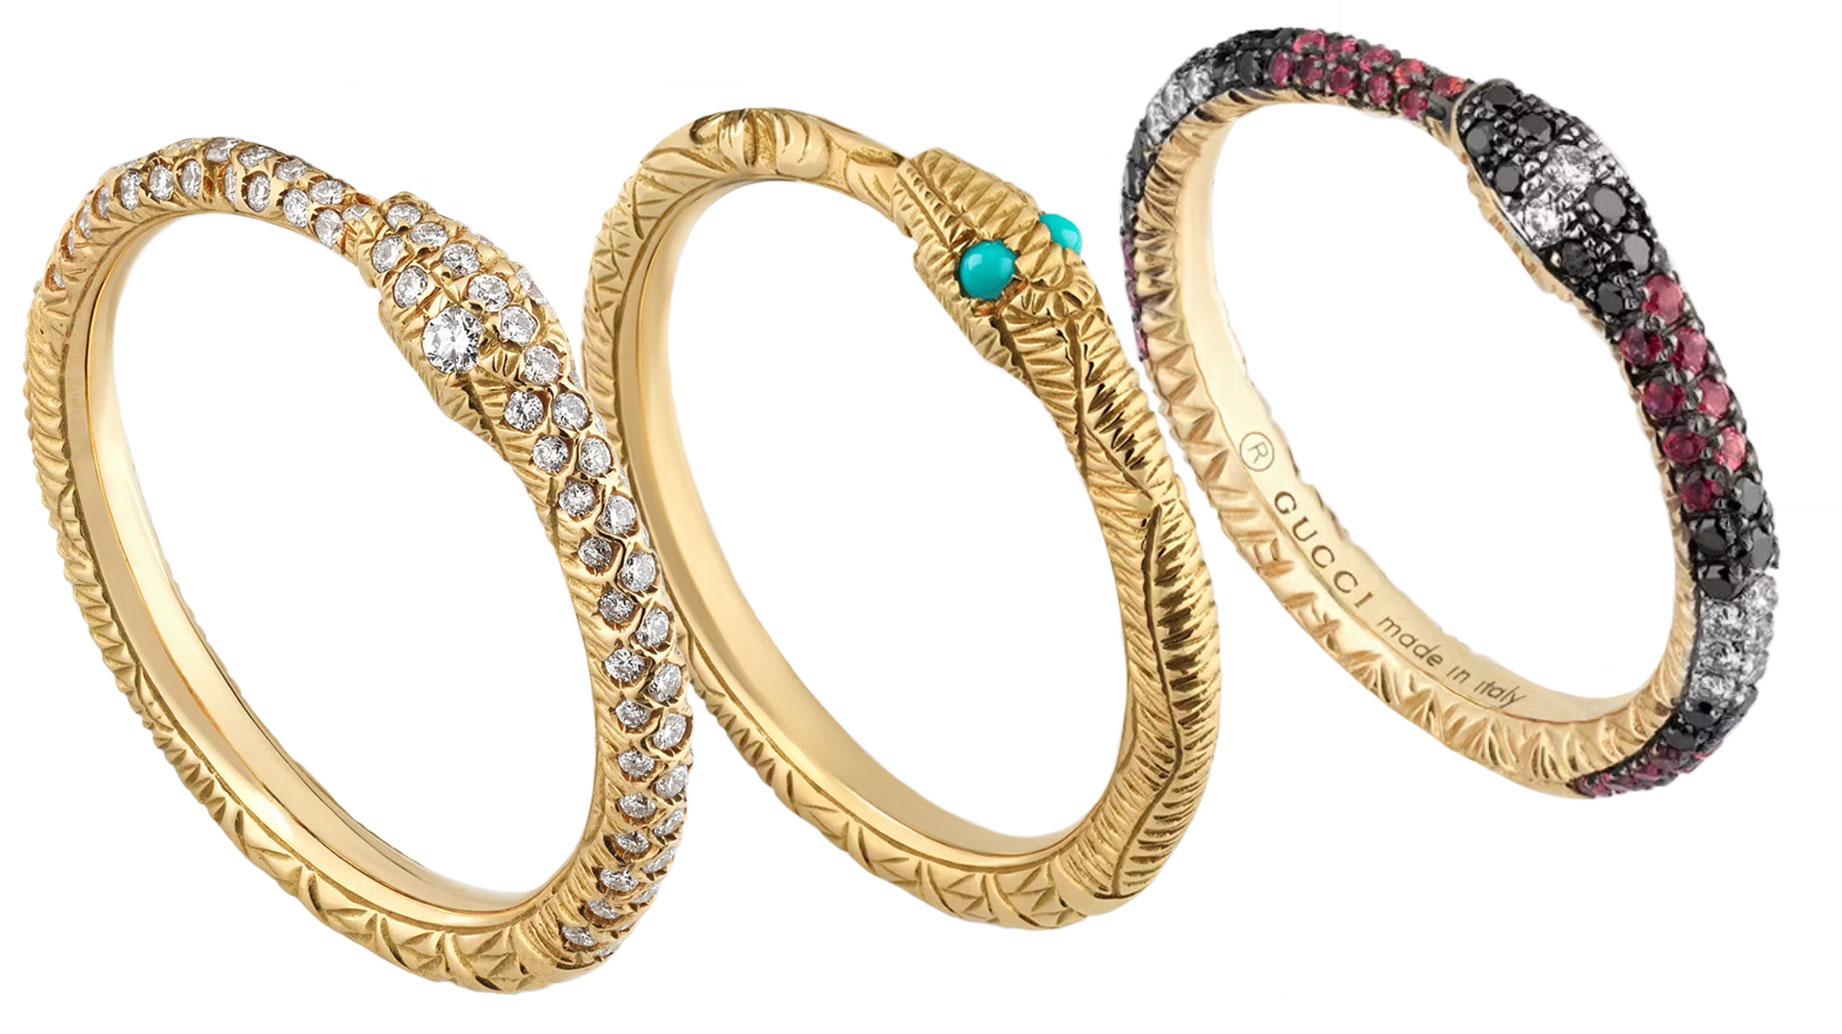 Gucci snake bangles